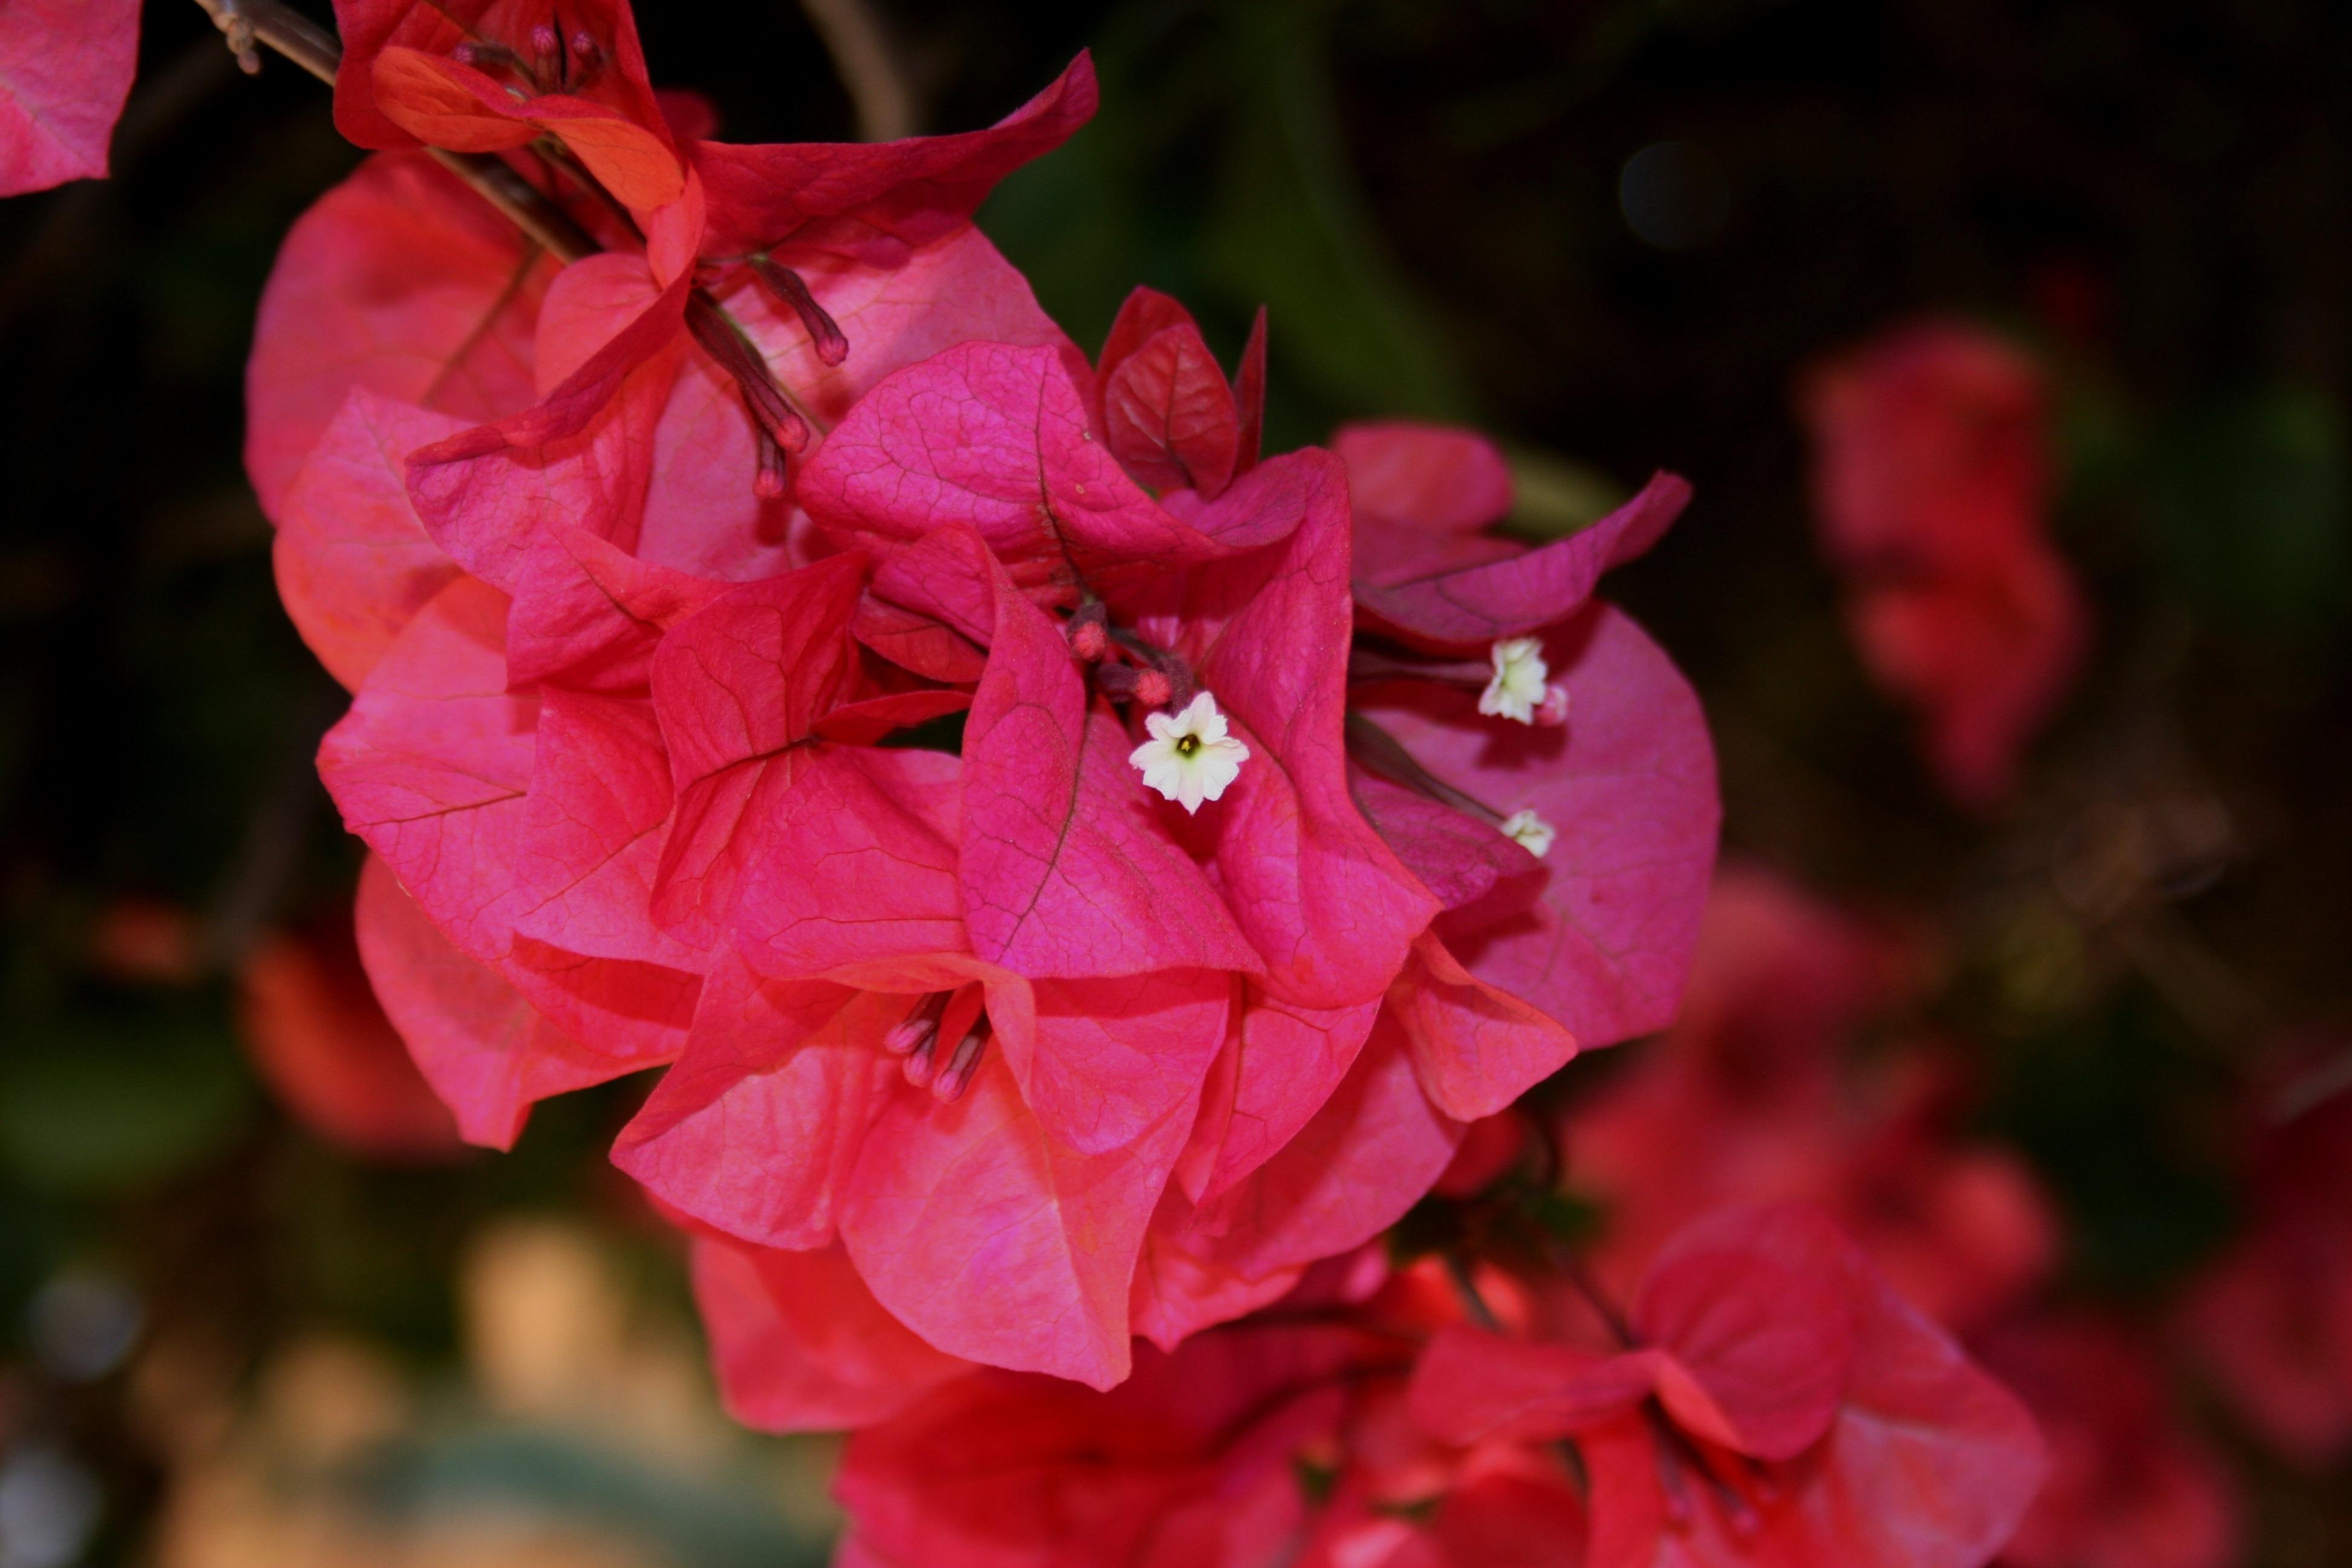 Free Images Branch Blossom Flower Petal Summer Spring Red